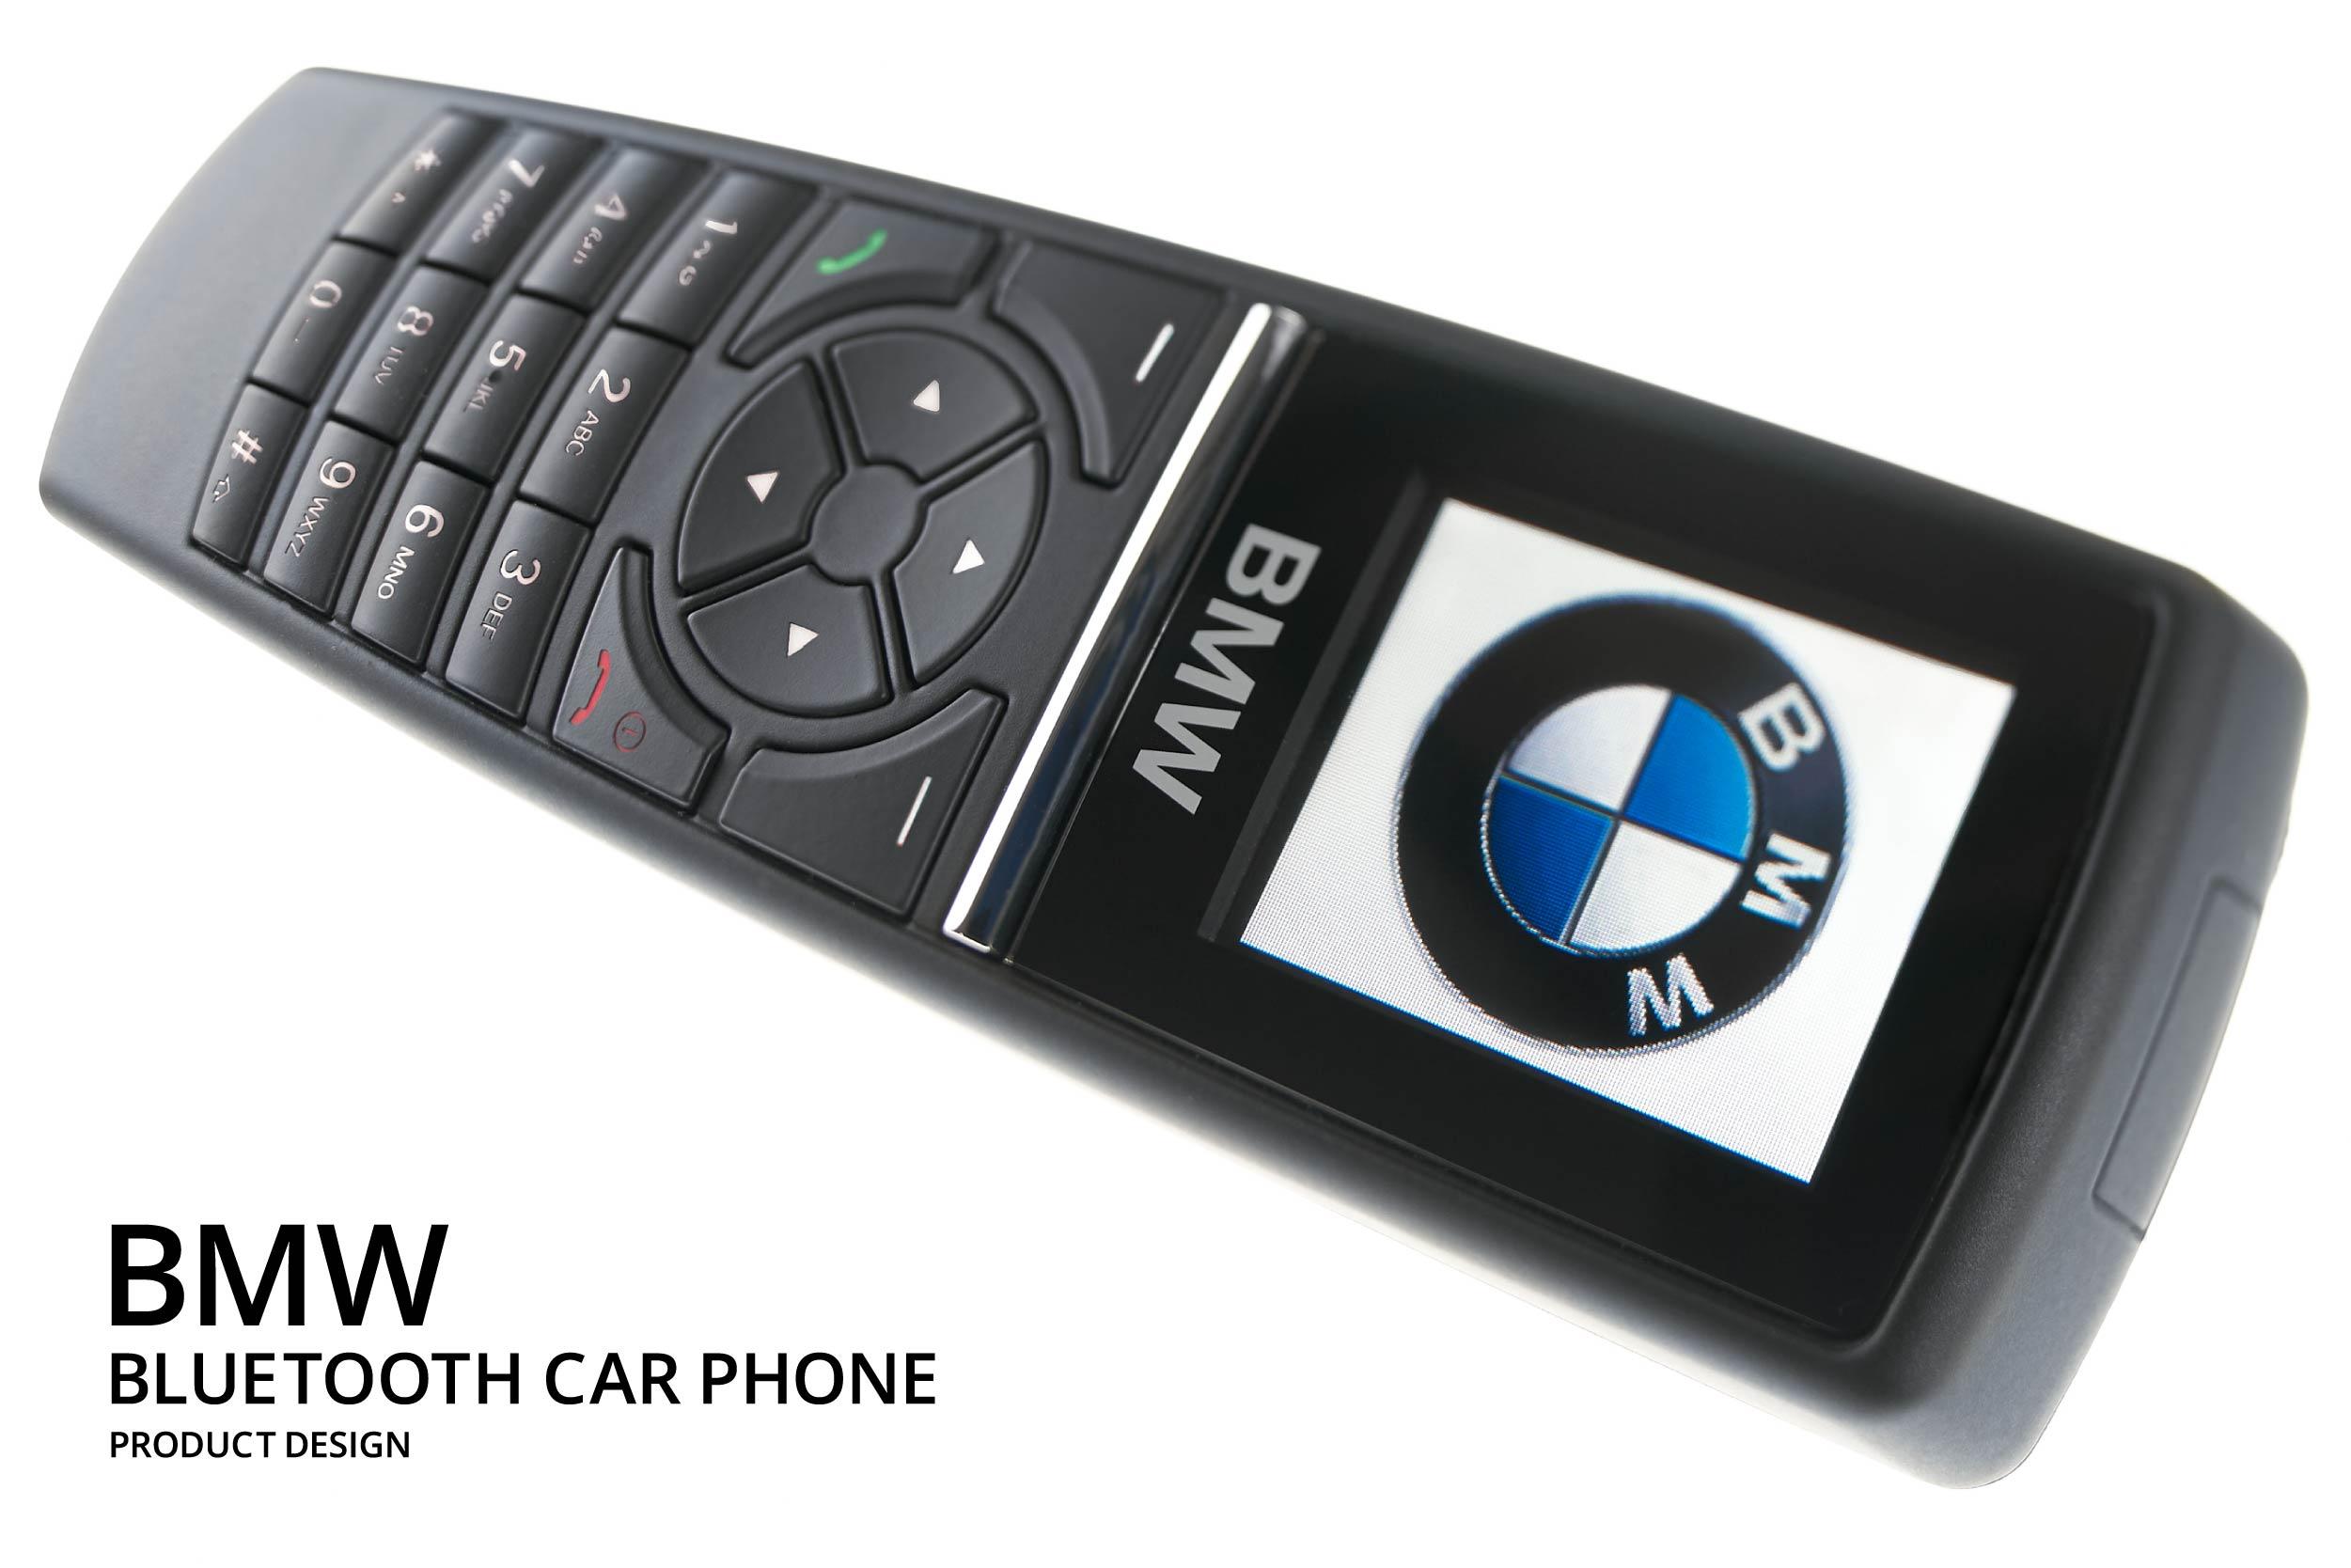 BMW-BLUETOOTH-HANDSET-1